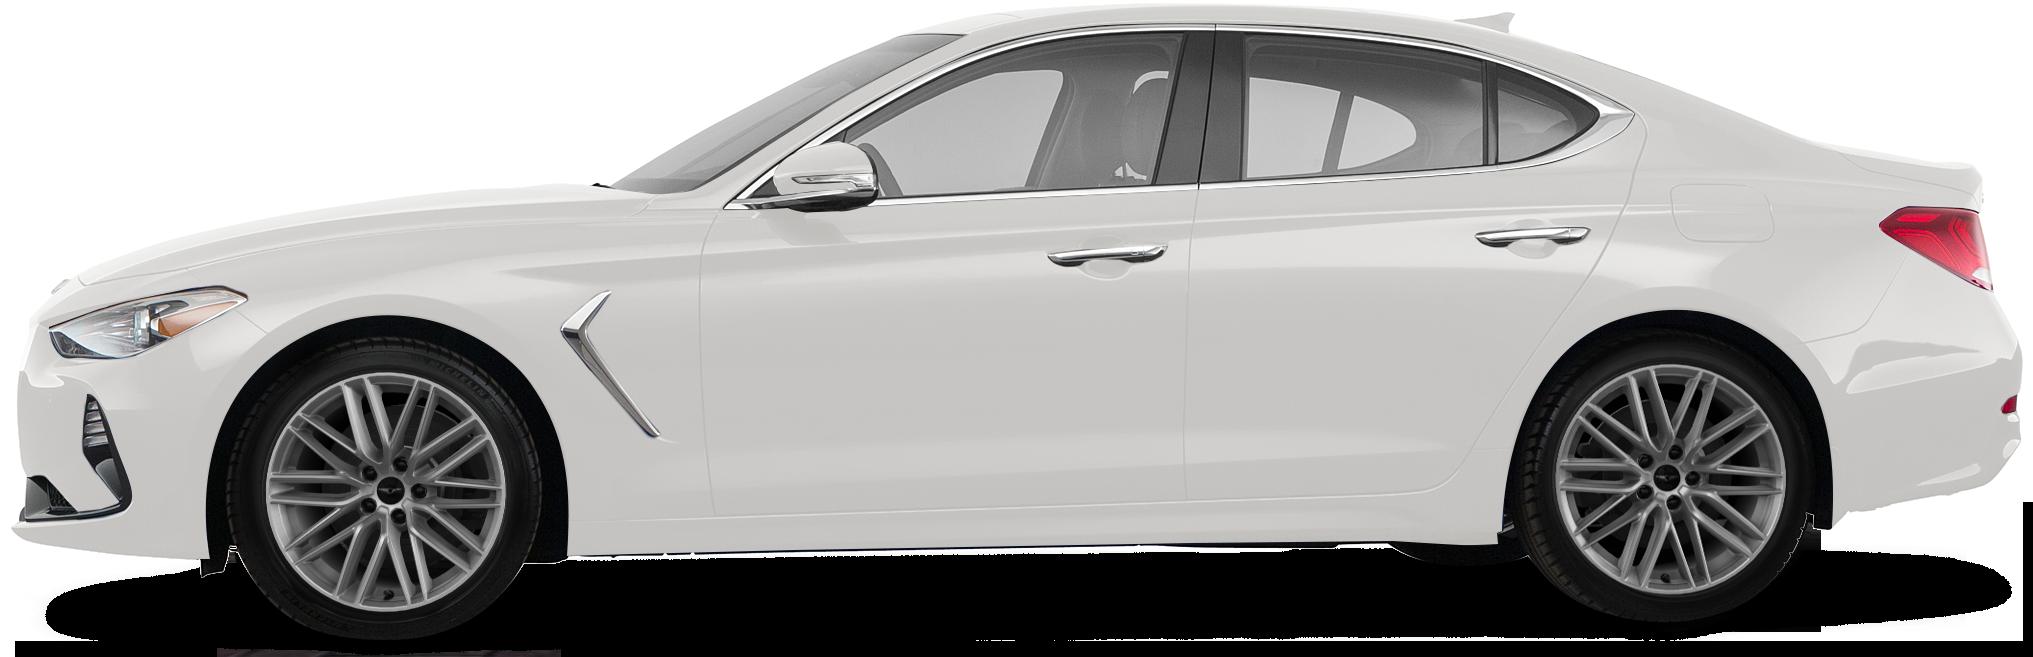 2020 Genesis G70 Sedan 2.0T Standard RWD